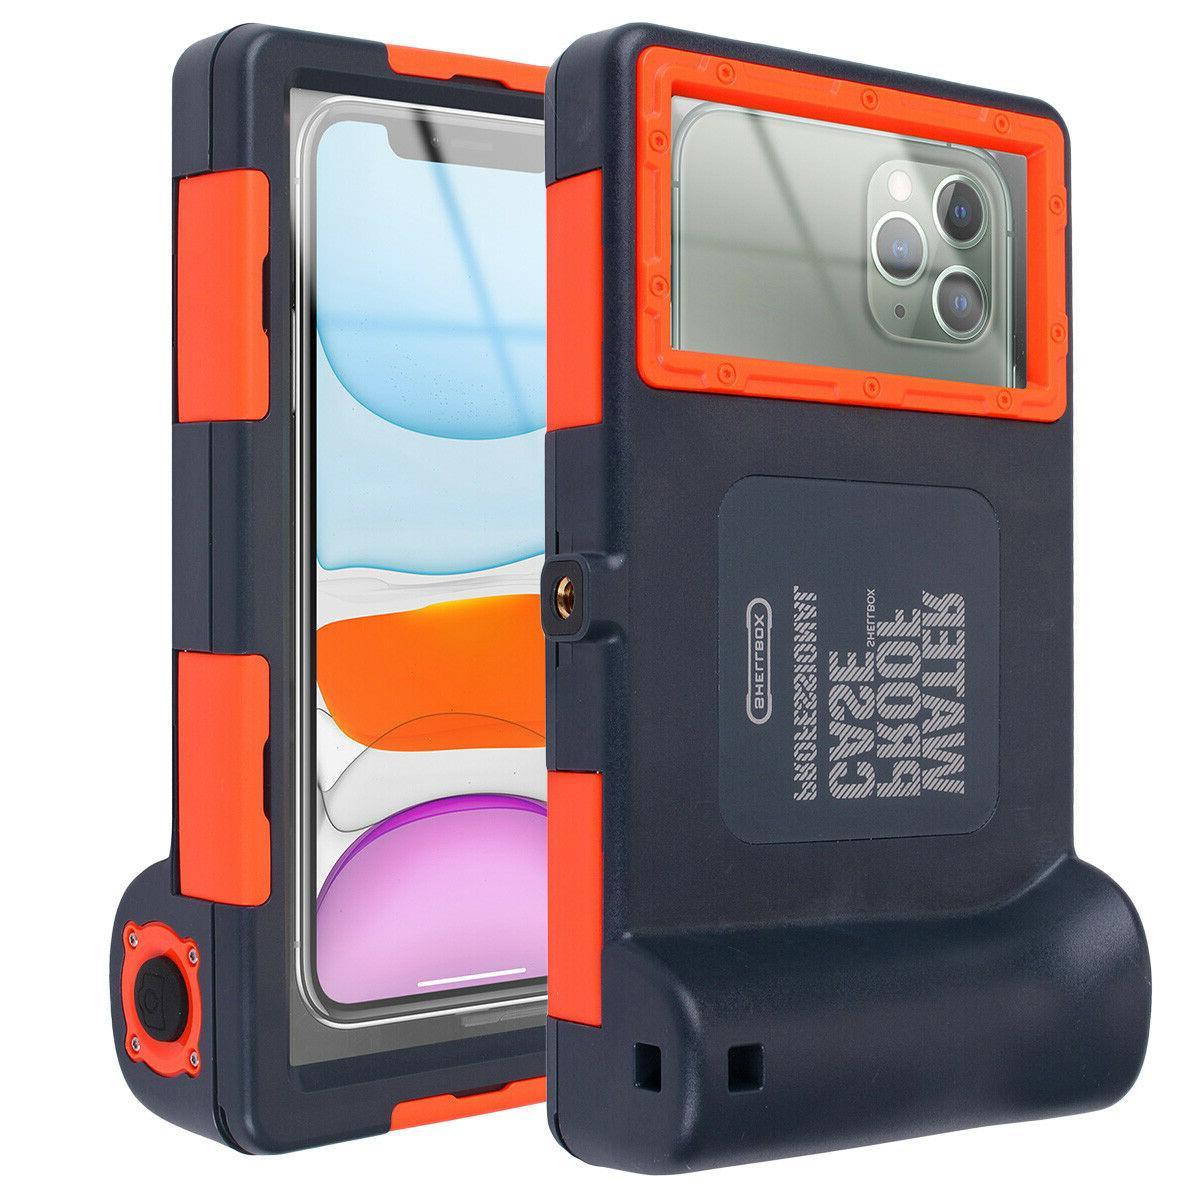 Universal Waterproof Case Underwater Camera iPhone 11